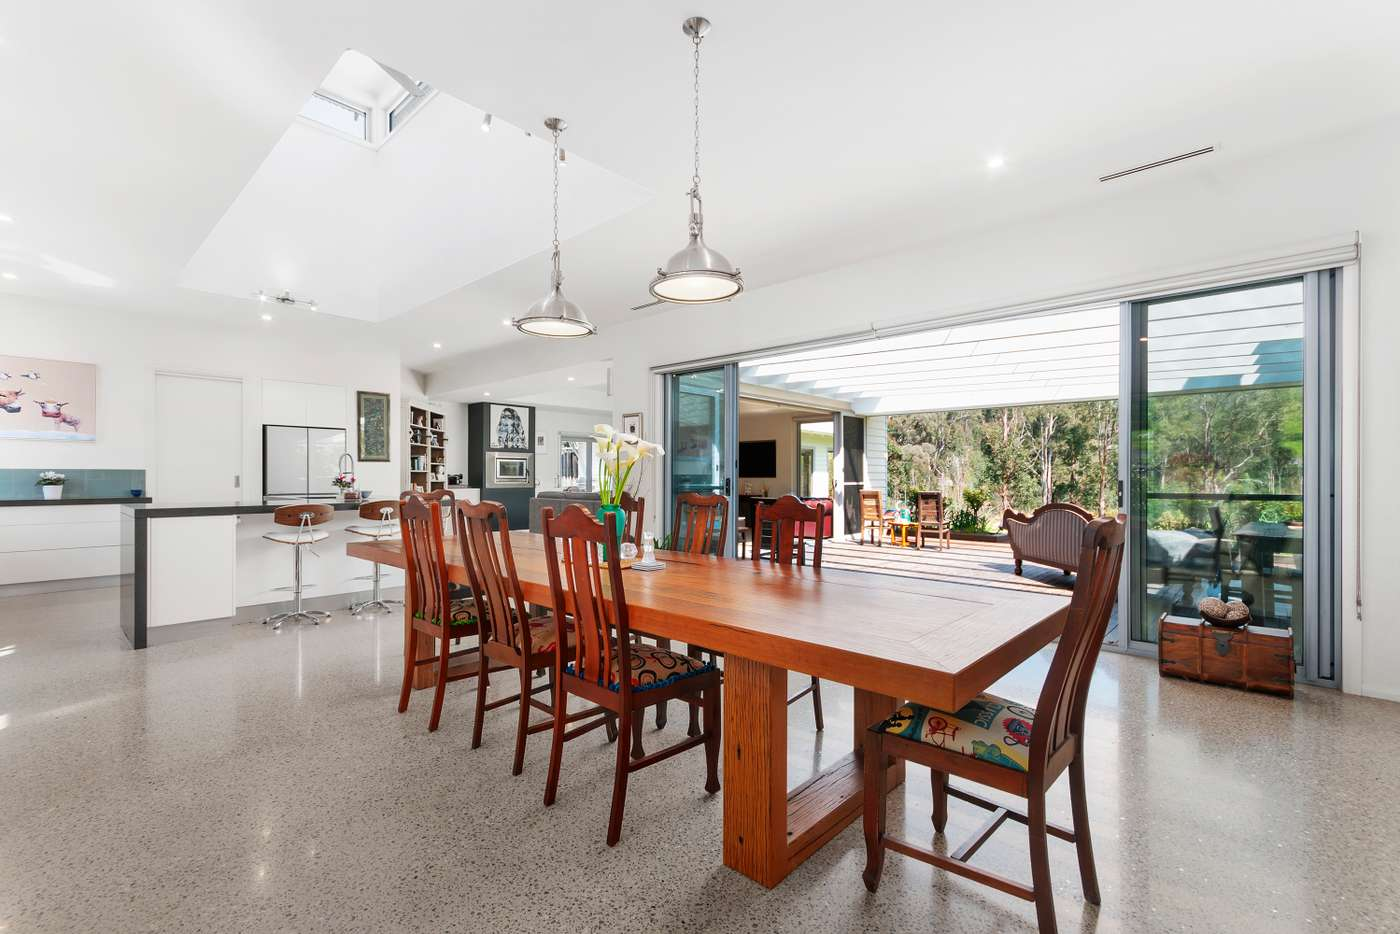 Main view of Homely acreageSemiRural listing, 1590 Traralgon Creek Road, Koornalla VIC 3844